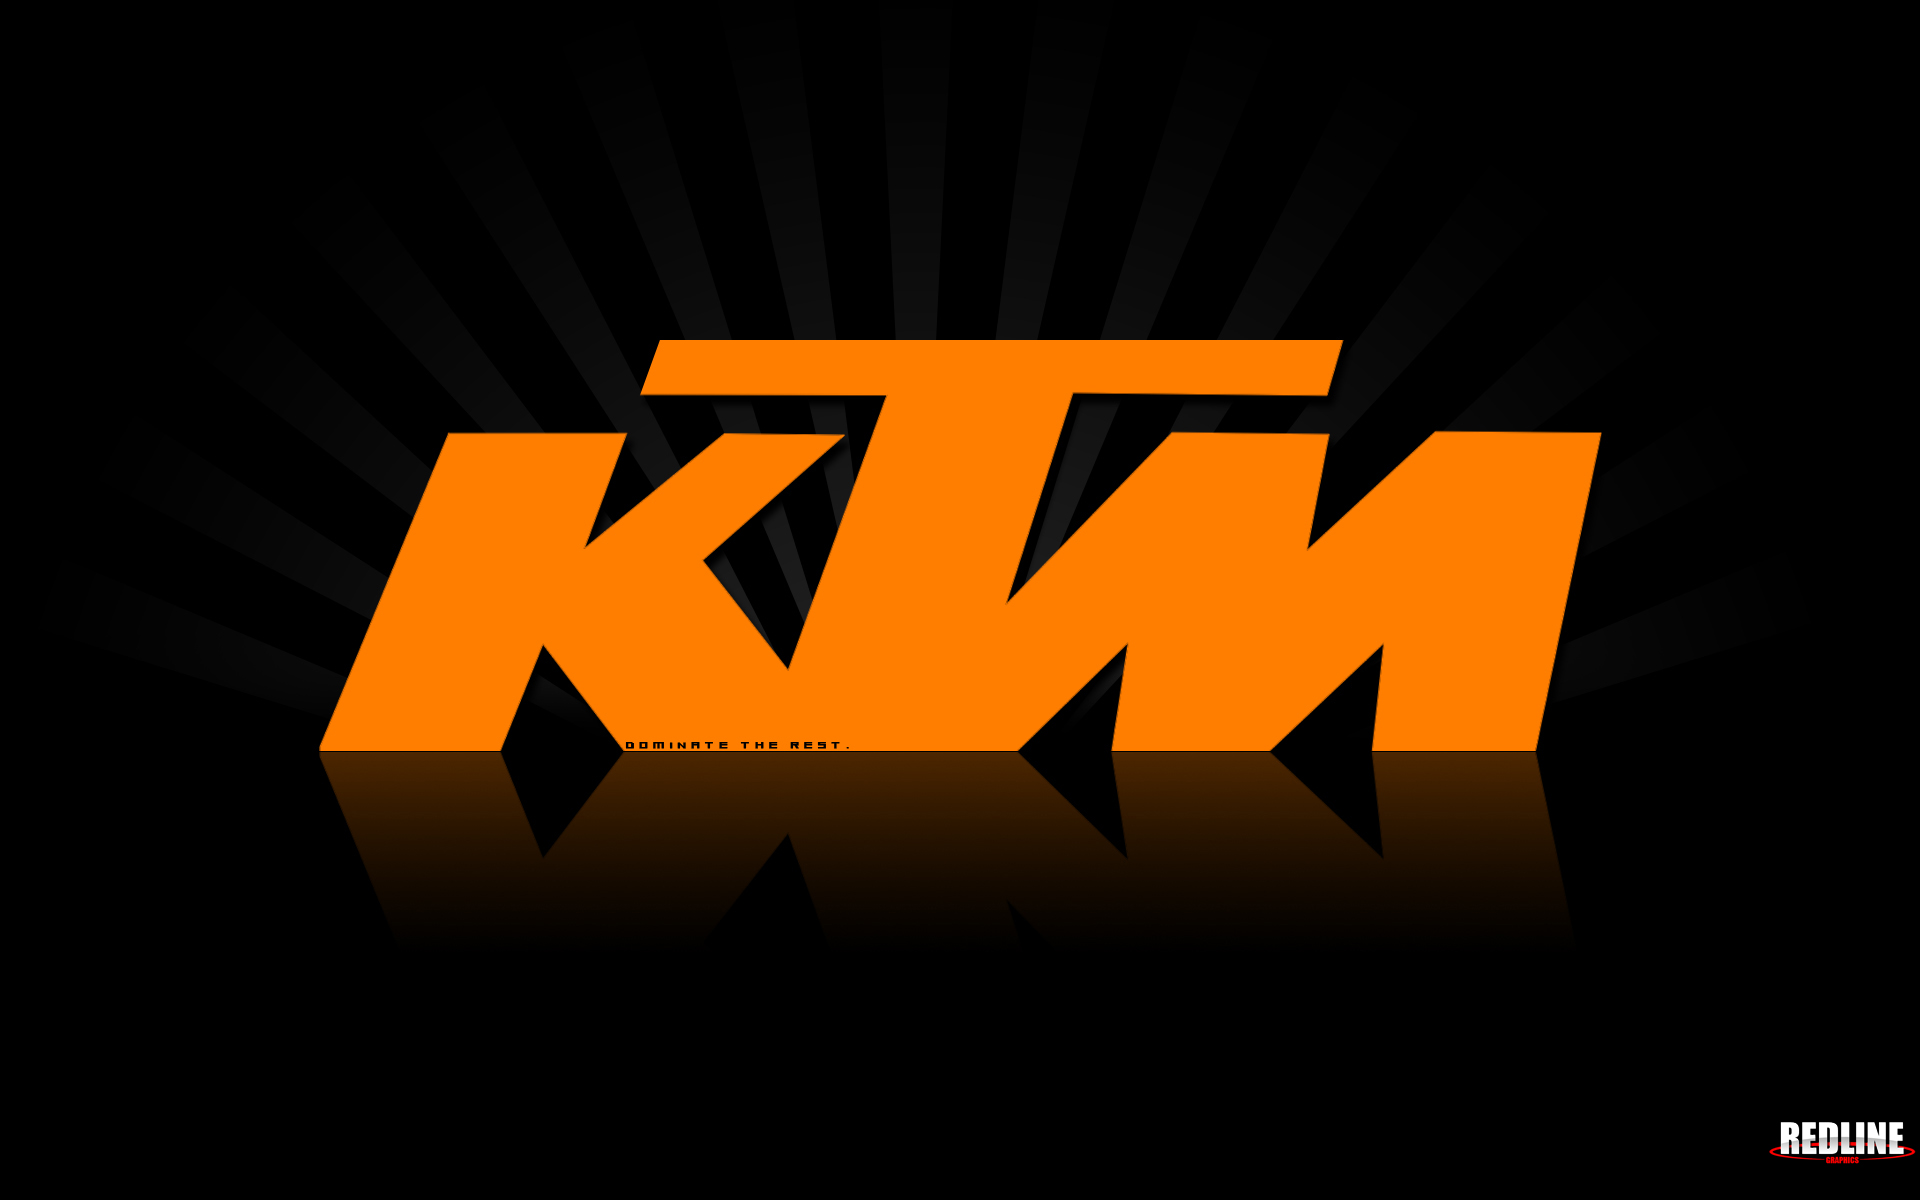 Ktm Redline Gfx By